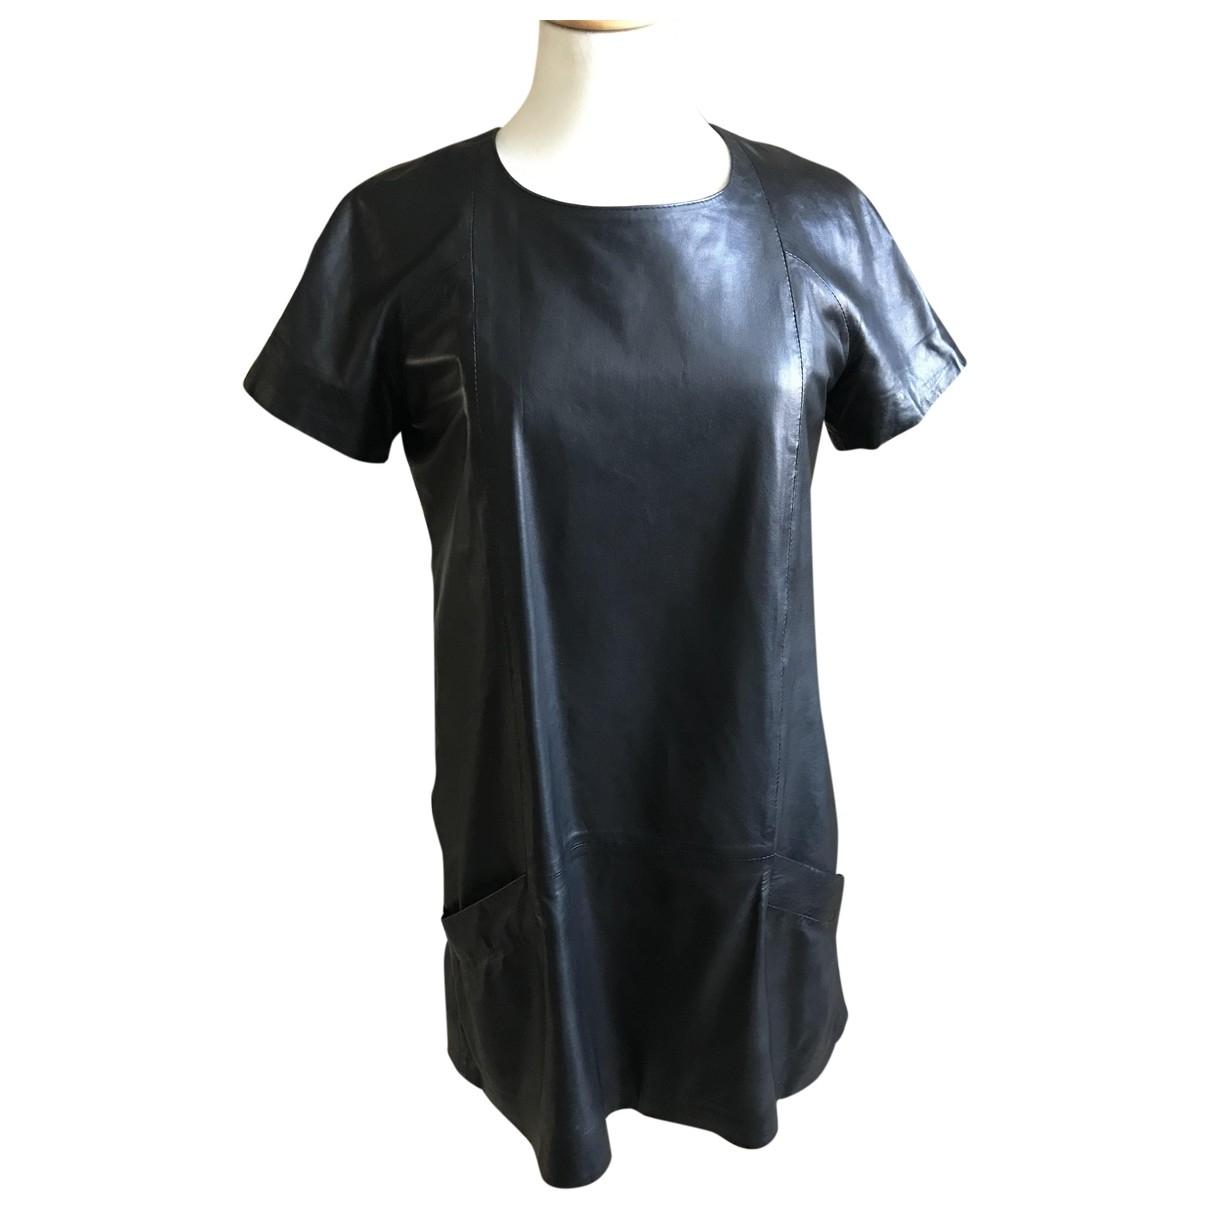 Enes \N Black Leather dress for Women 38 FR